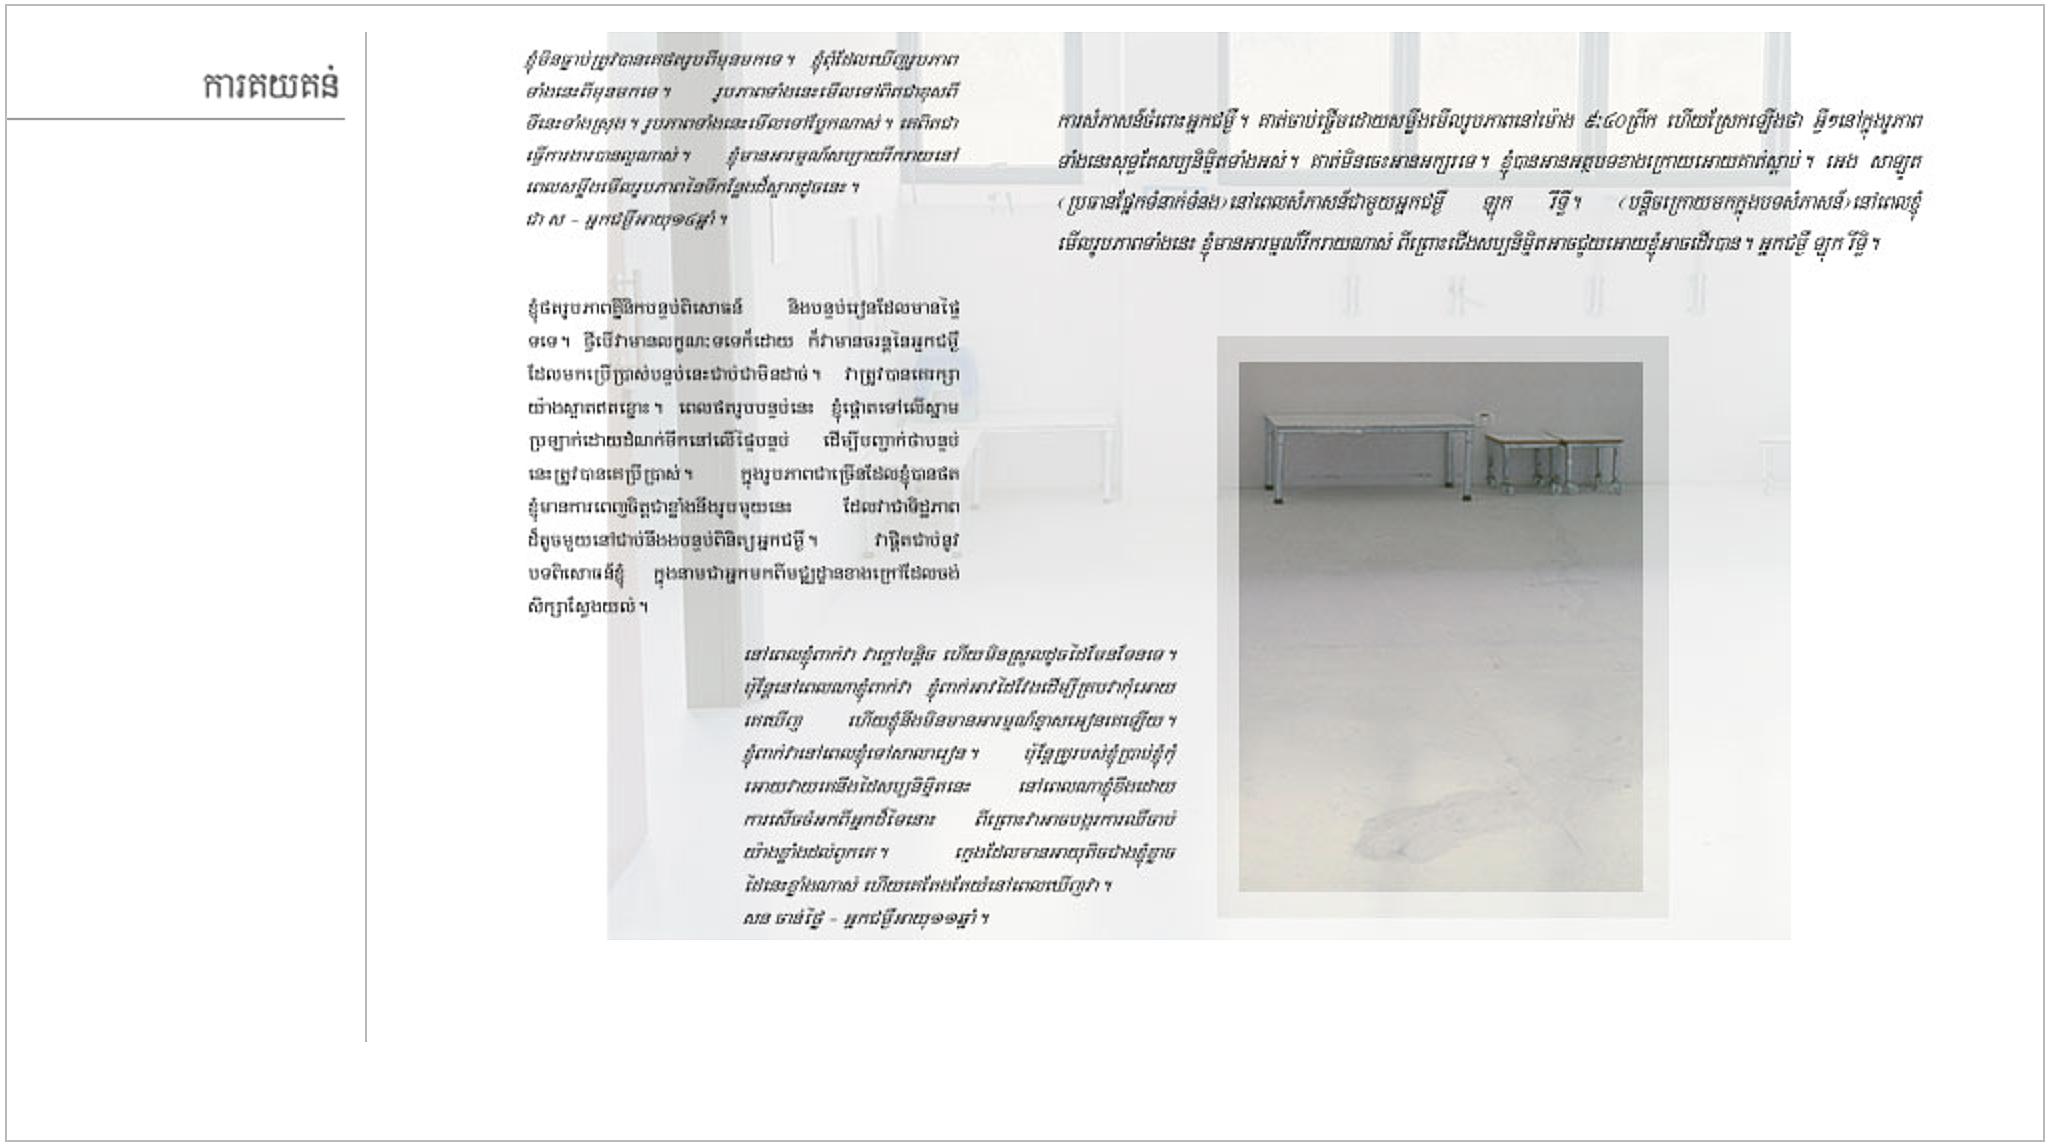 pg 14 copy.jpg